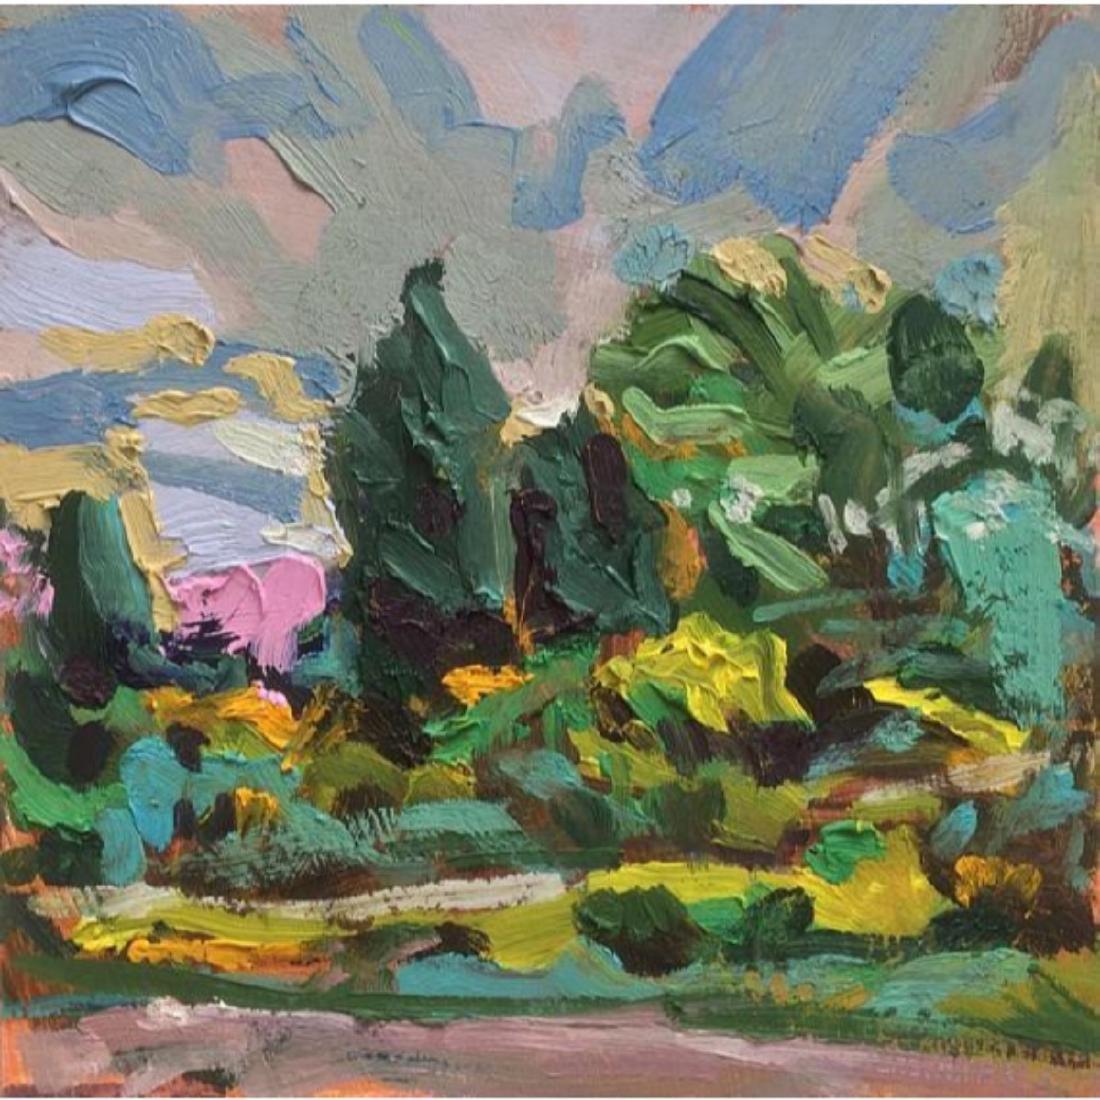 21stc Impressionism, Signed British Landscape, Oil